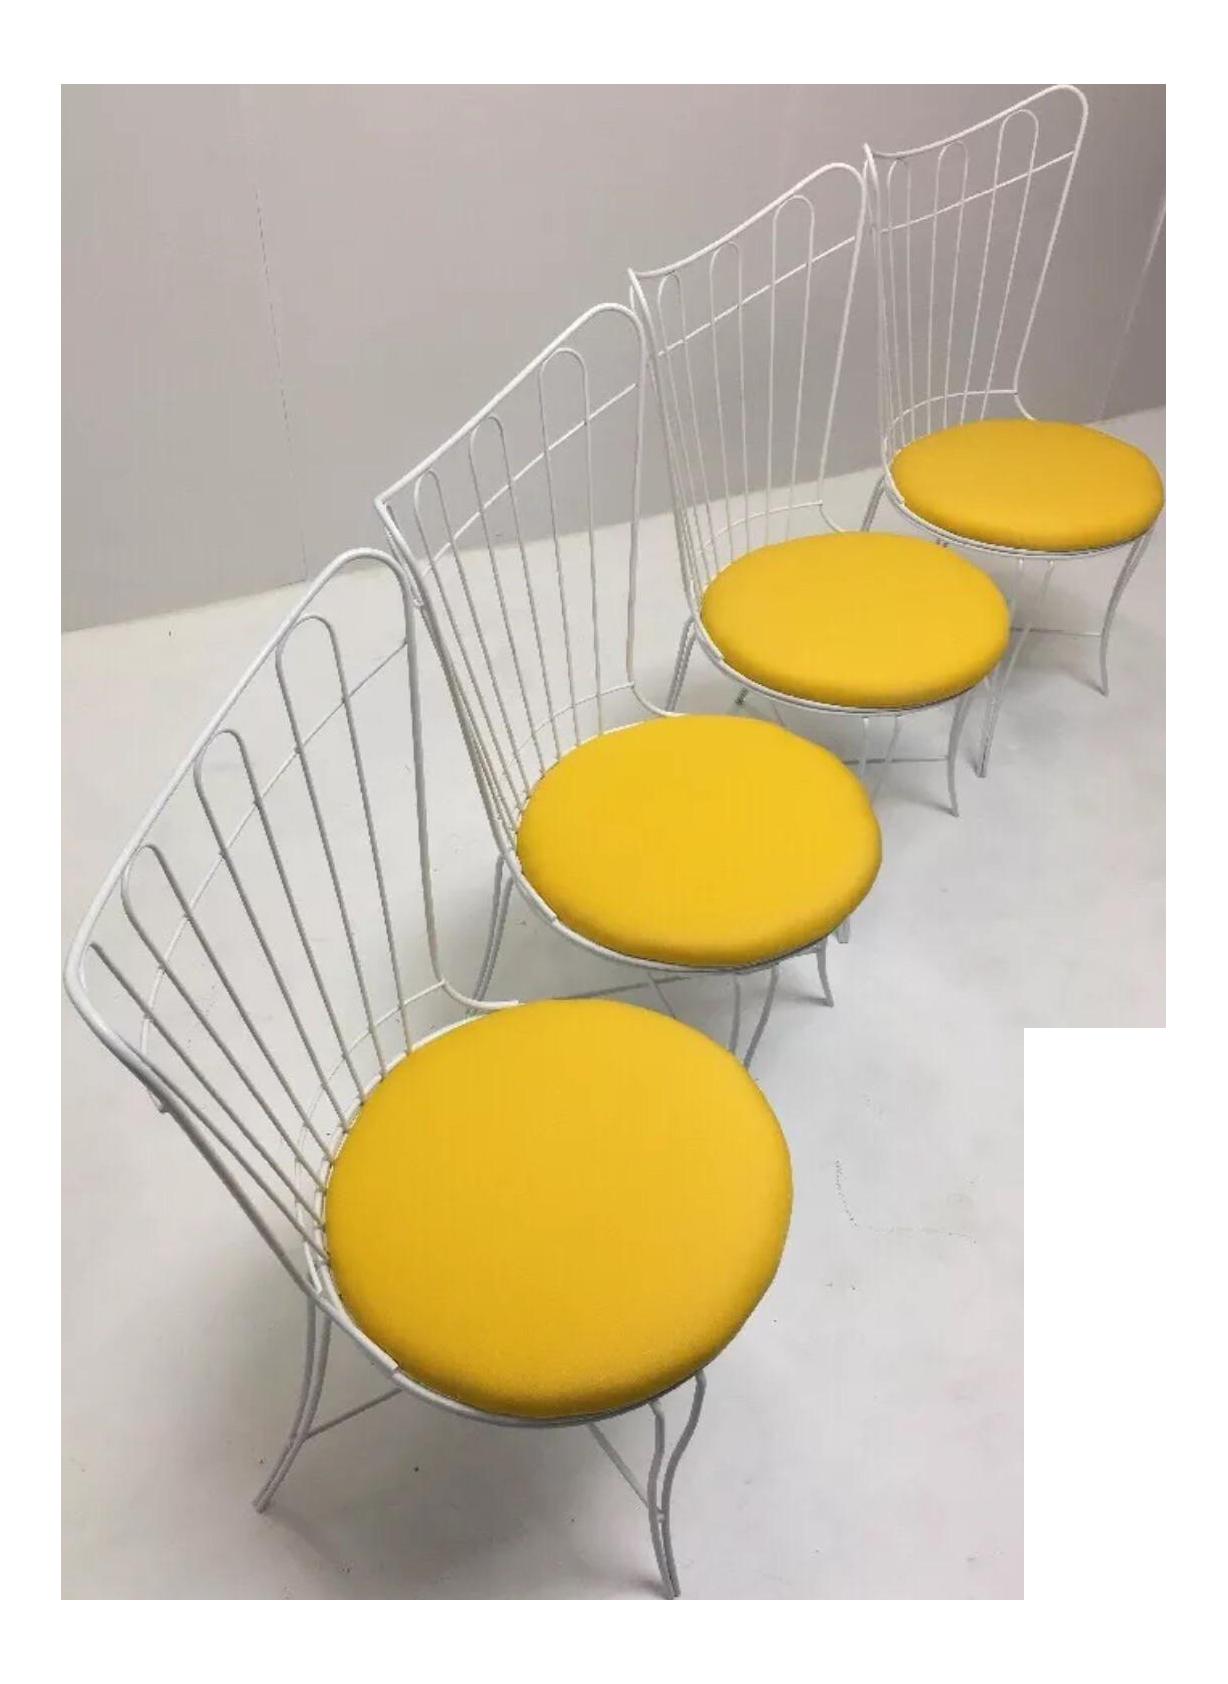 Retro Vintage Homecrest Patio Dining Chairs   Set Of 4 On Chairish.com